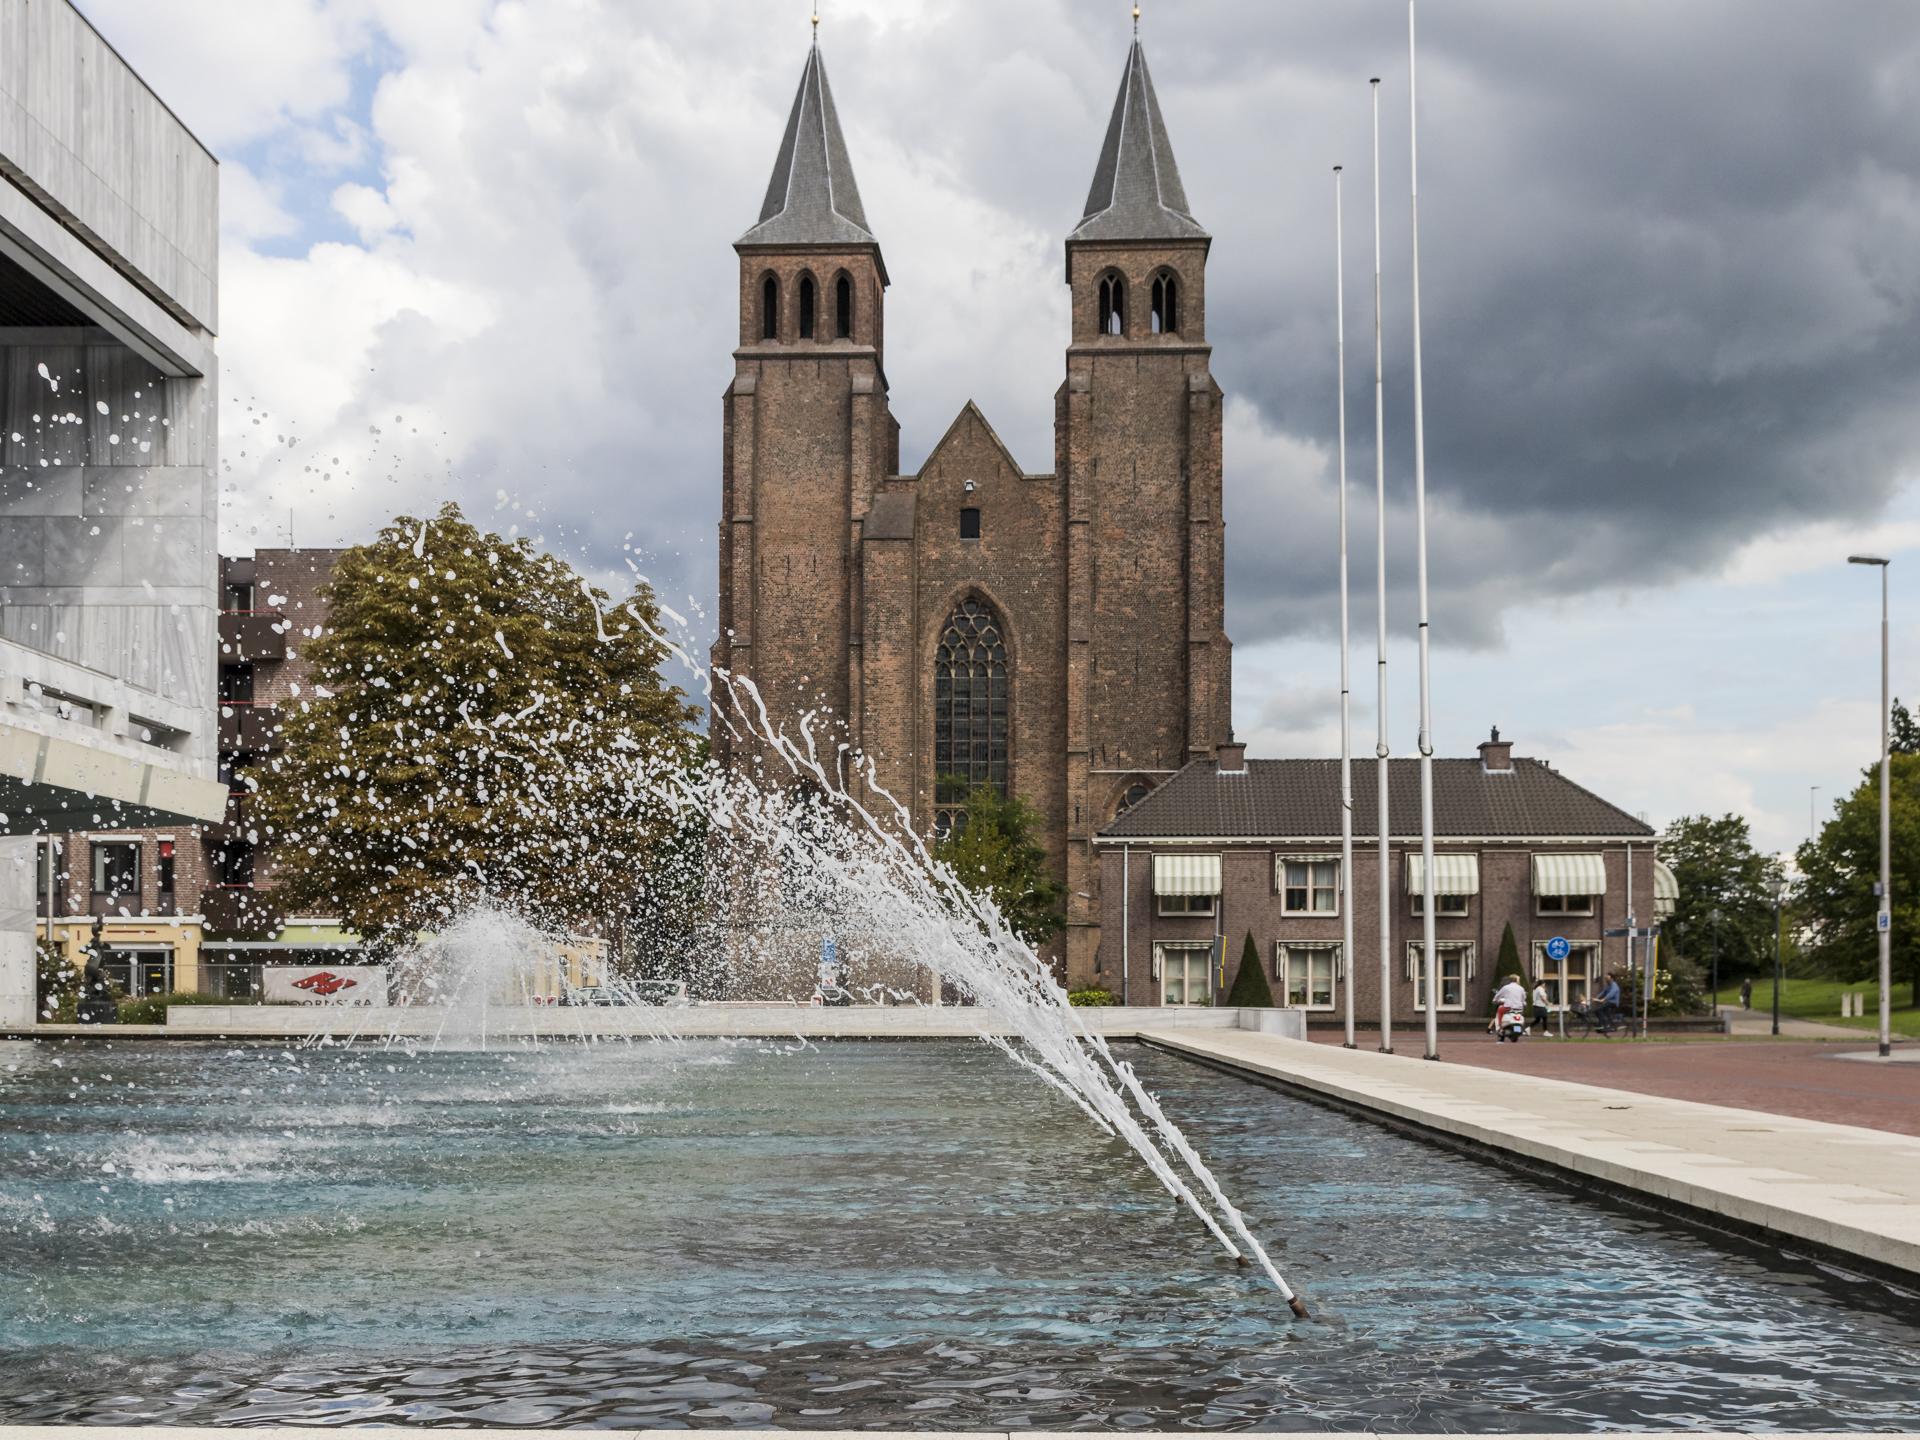 Arnheim Eusebiuskirk Tagesausflug Städtetrip Europa Holland Niederlande Tipps